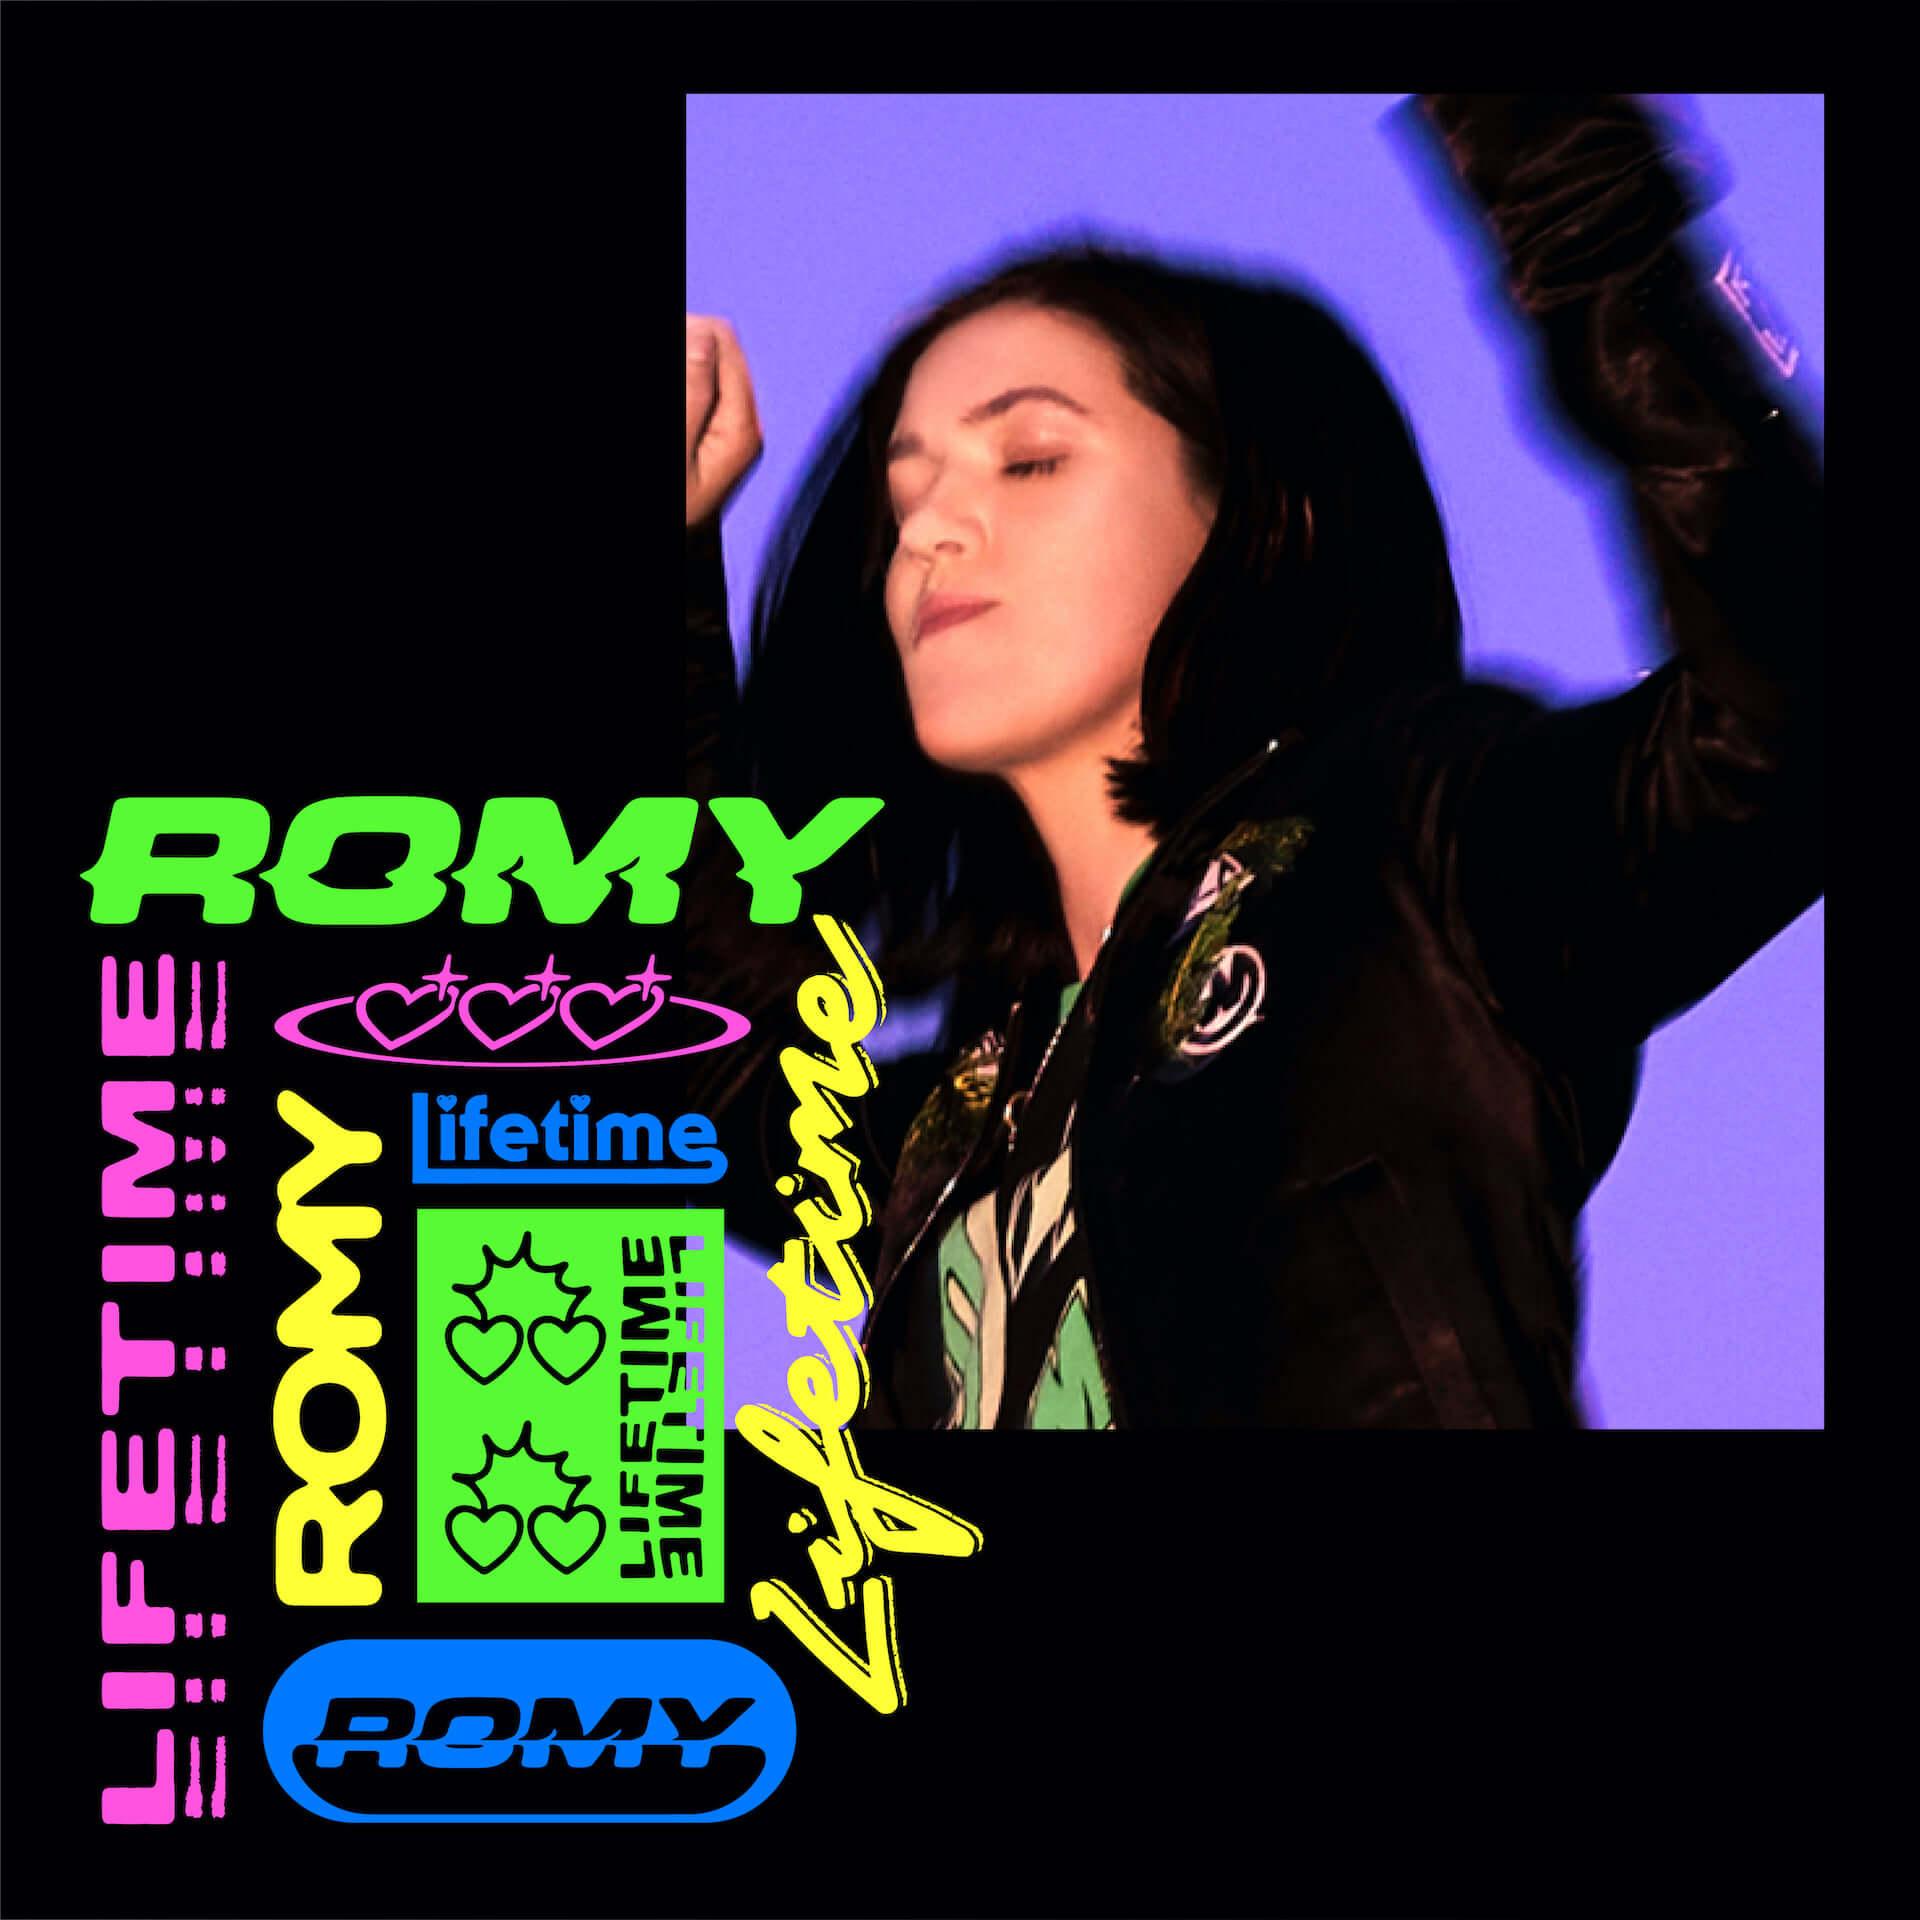 "The xxのRomyがソロデビュー曲""Lifetime""のリミックス集をリリース!Jayda G、HAAi、Anz、Planningtorockが参加&コメントも到着 music201203_romy_2-1920x1920"